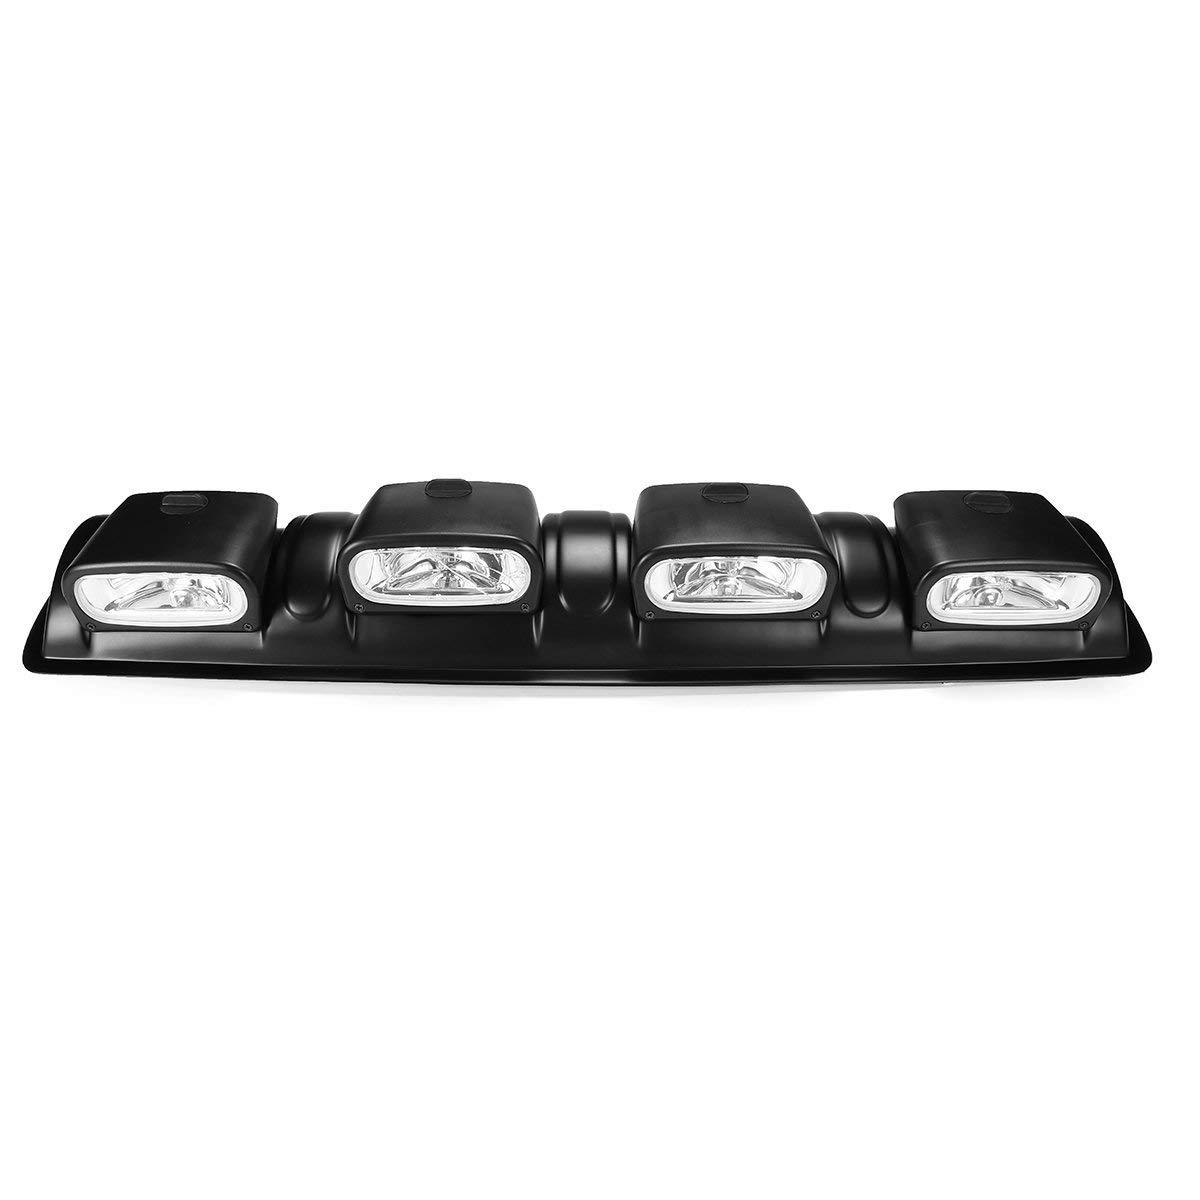 Fincos 12V H3 Black Car 4x4 Roof Top Bar Fog Lights Universal Off Road Spot Head Lamps